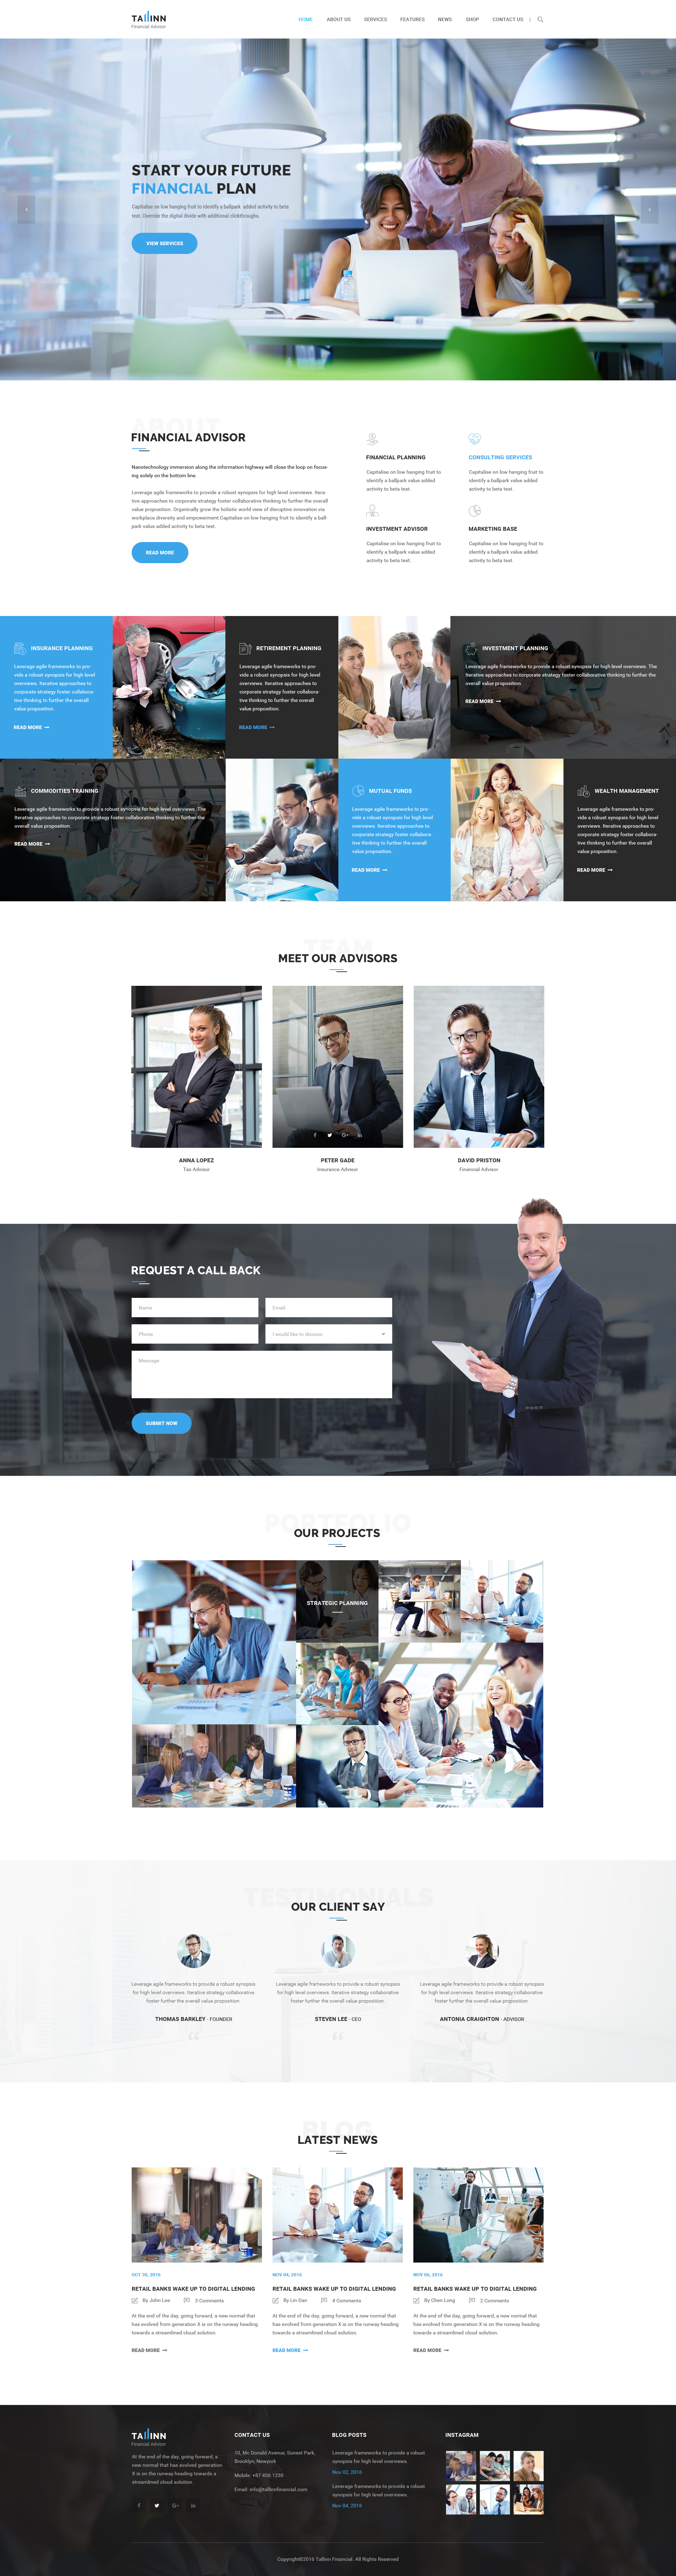 Business Finance and Consultancy HTML Template - Tallinn by Themecraze